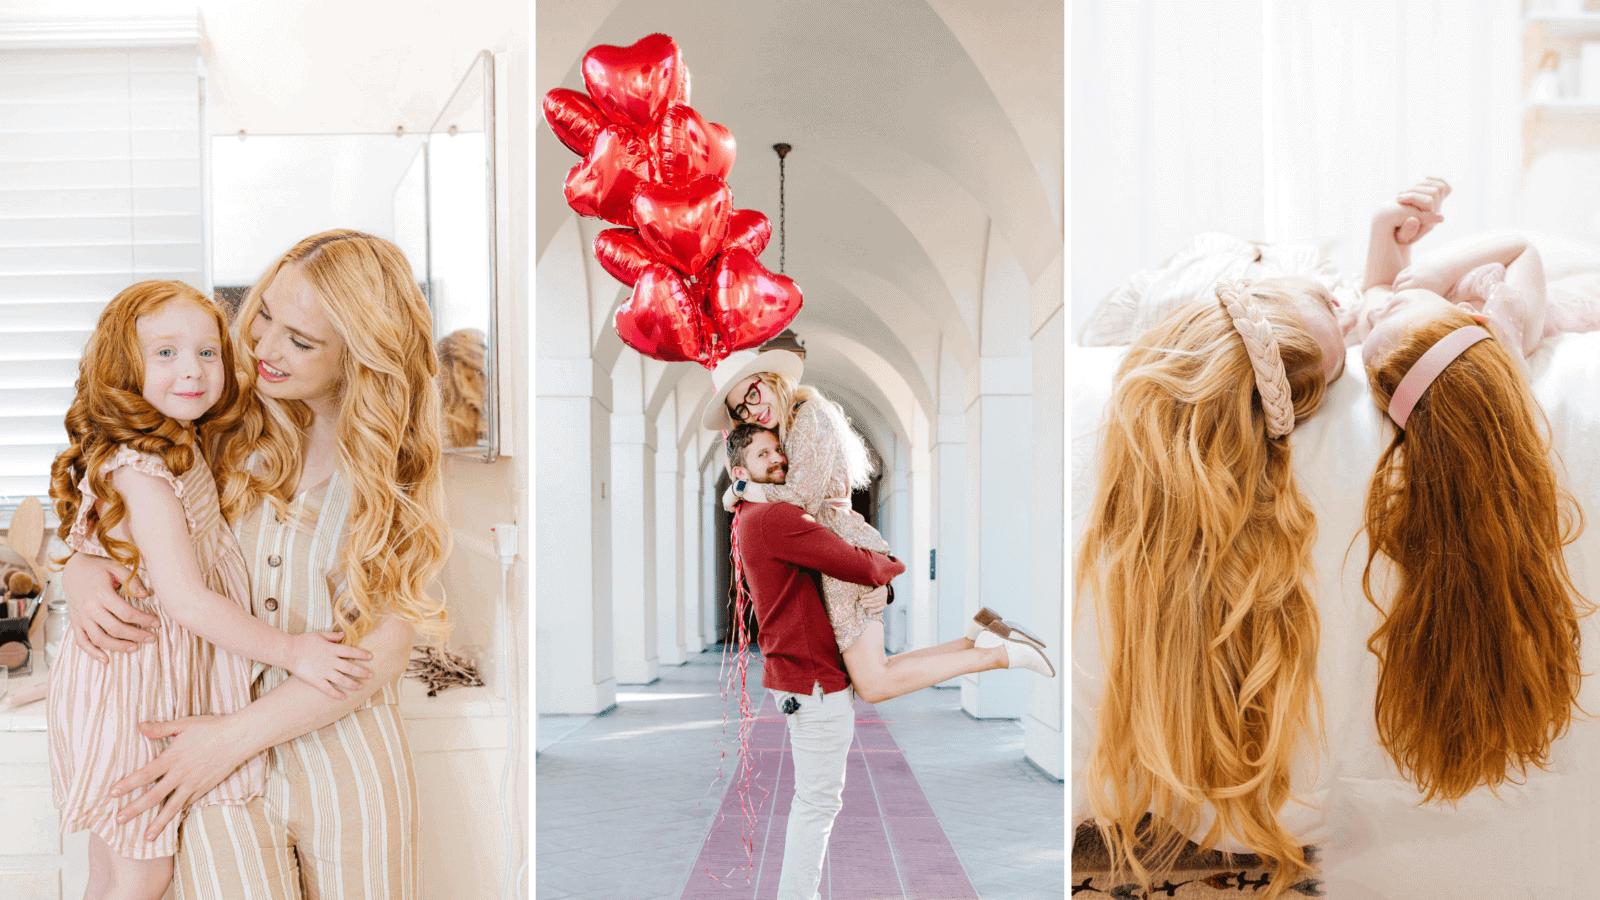 Celeste Wright - Blogger & Content Creator